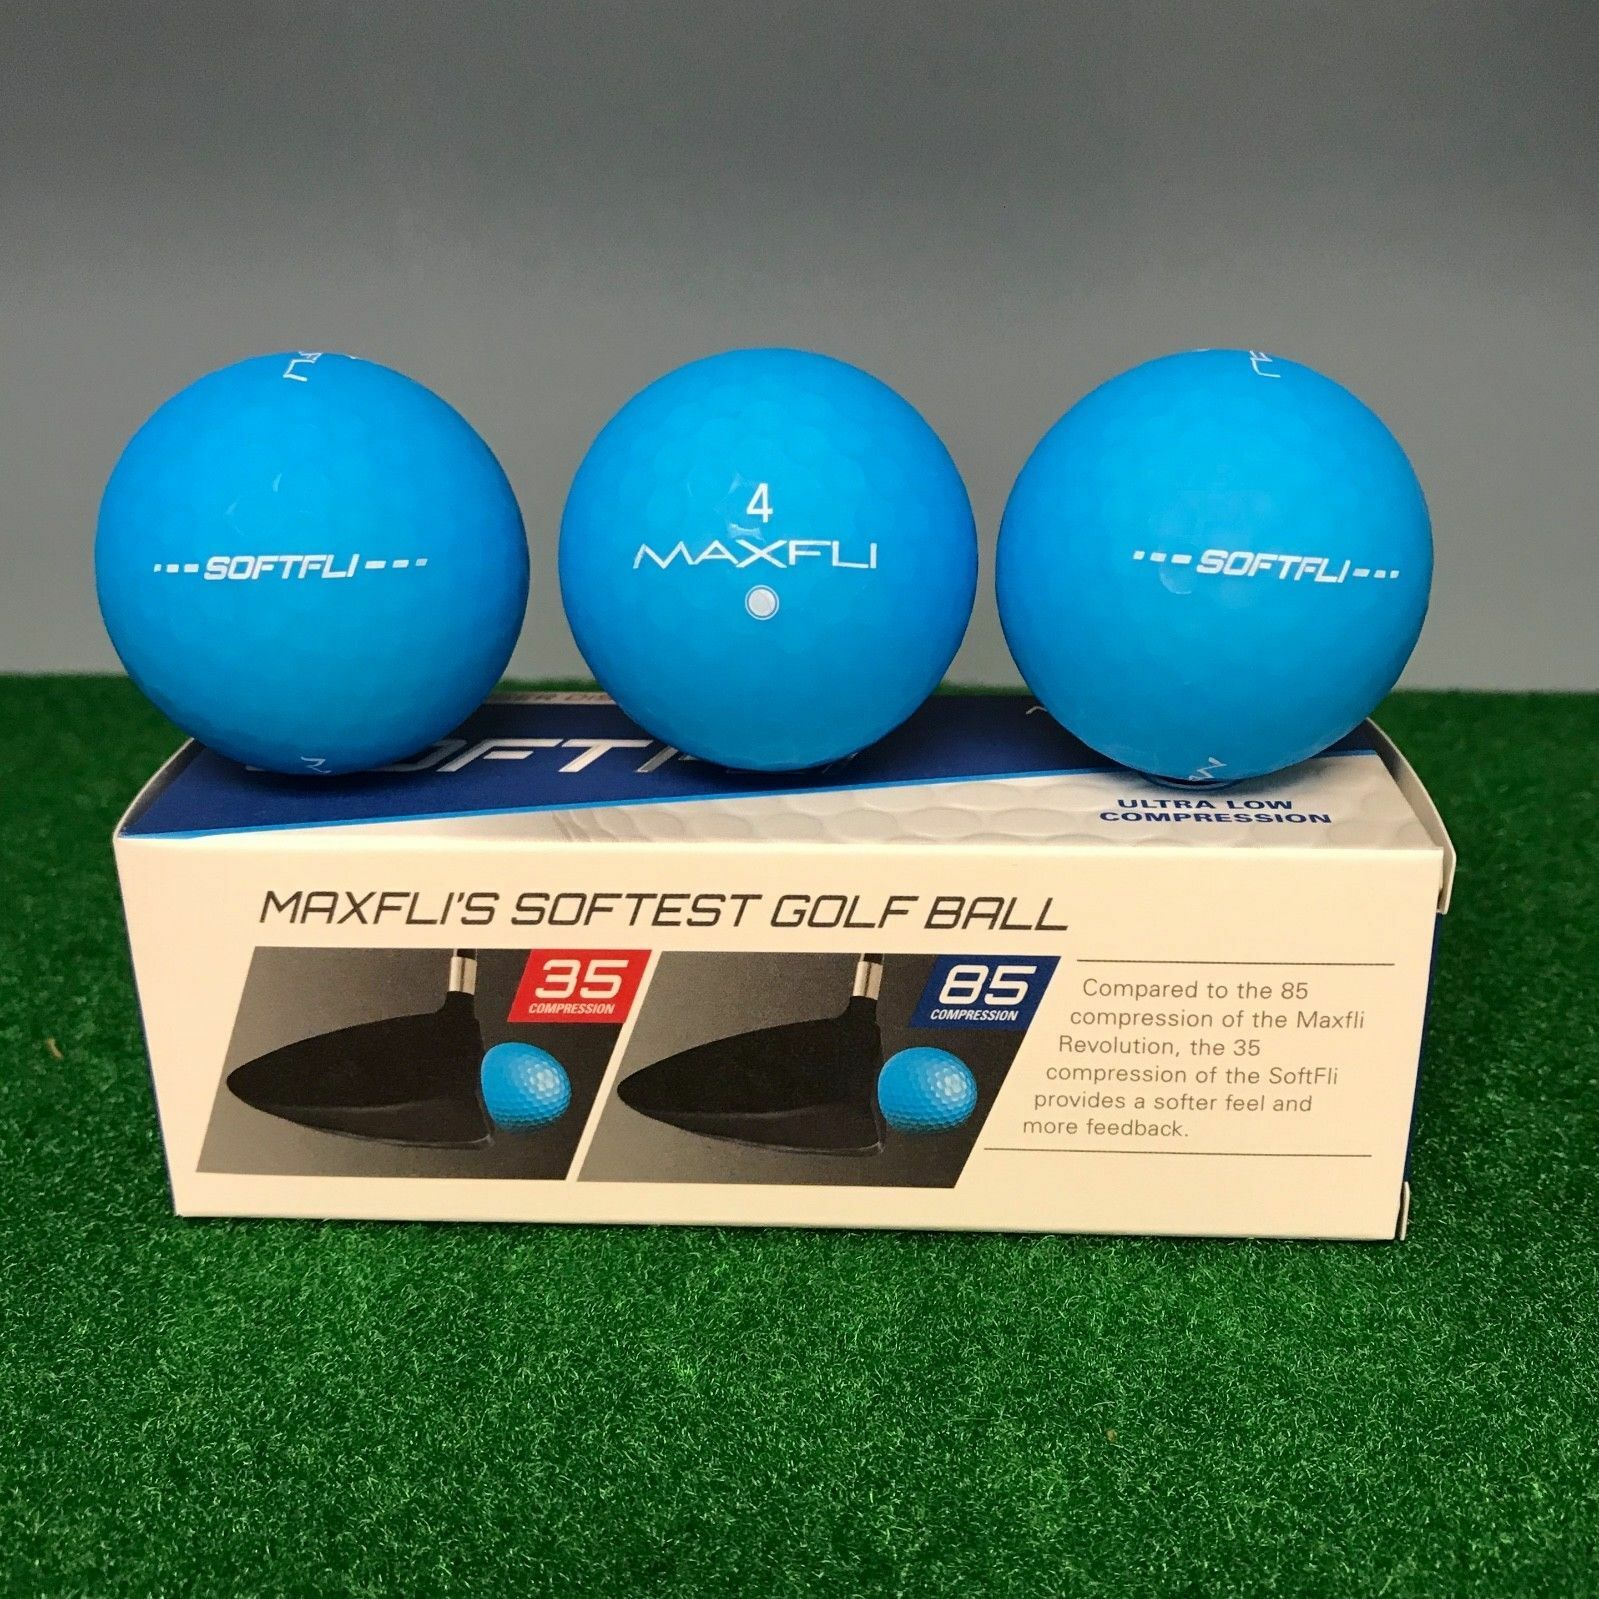 Maxfli SOFTFLI Vivid Color Golf Balls - BLUE  - NEW 3-BALL S